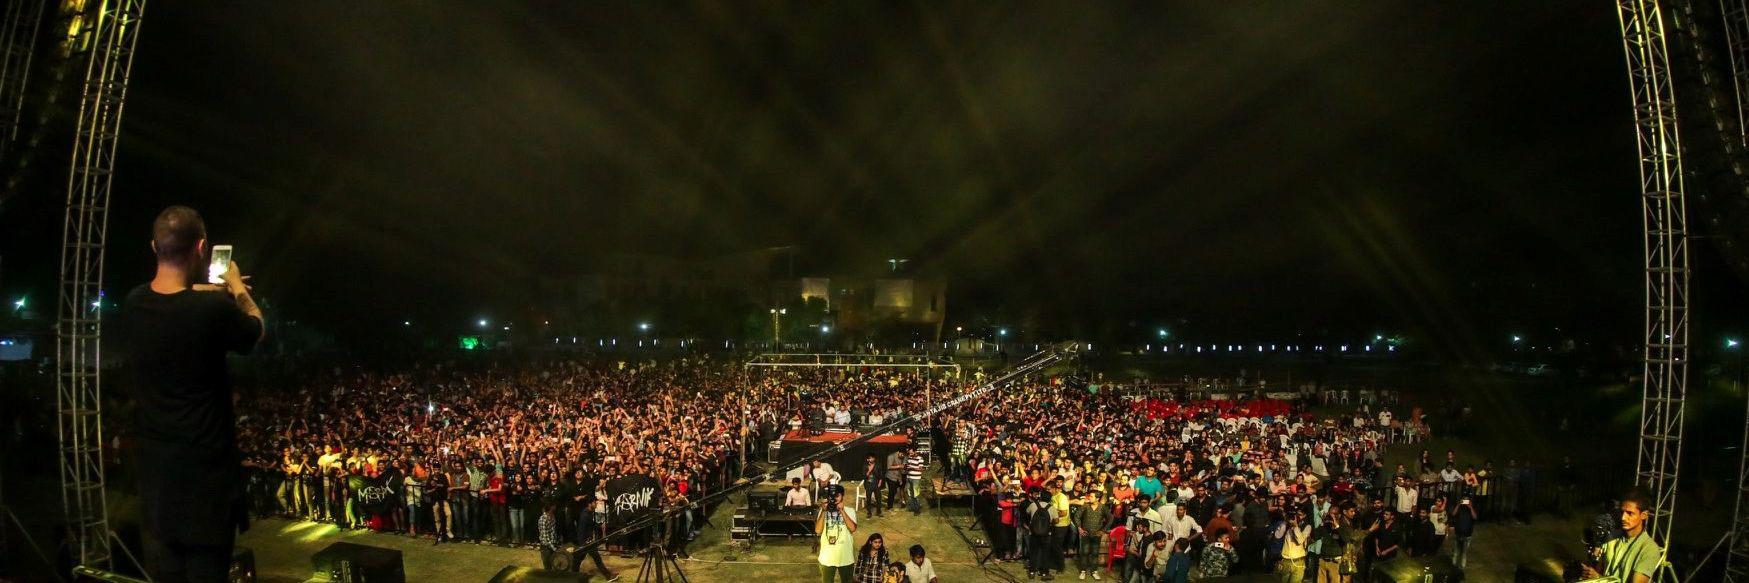 Insider's View on Organising Multi-Crore Festivals